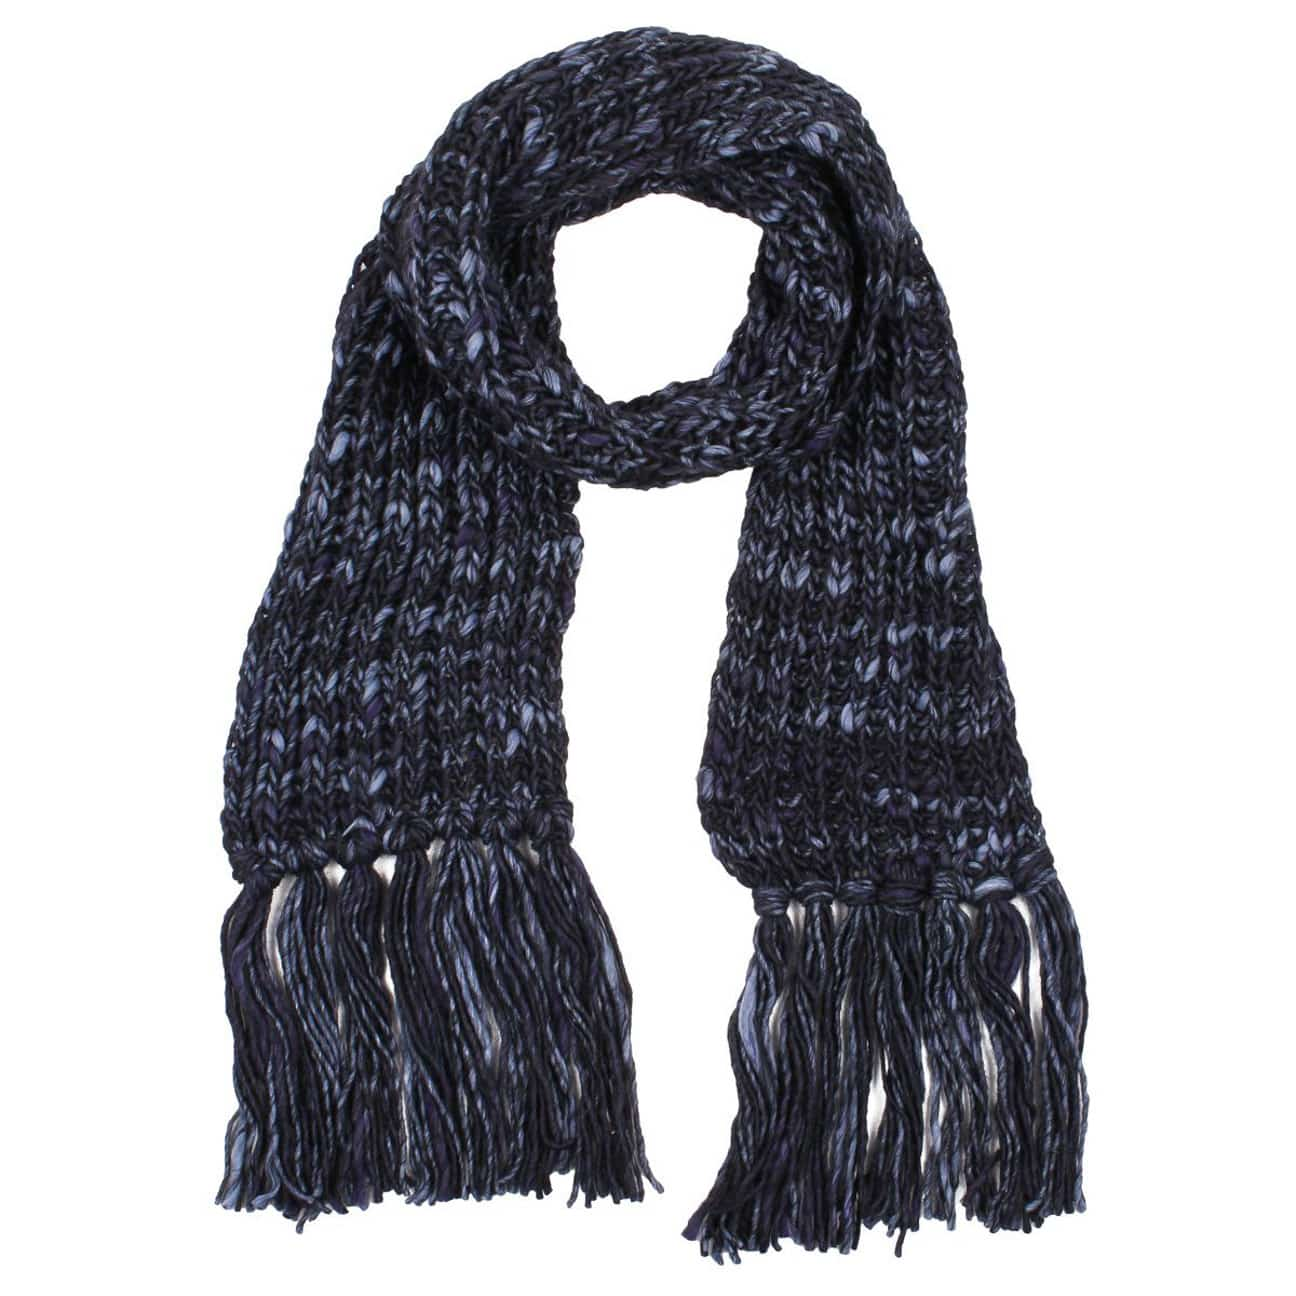 argun wool knit scarf by mcburn eur 29 95 gt hats caps